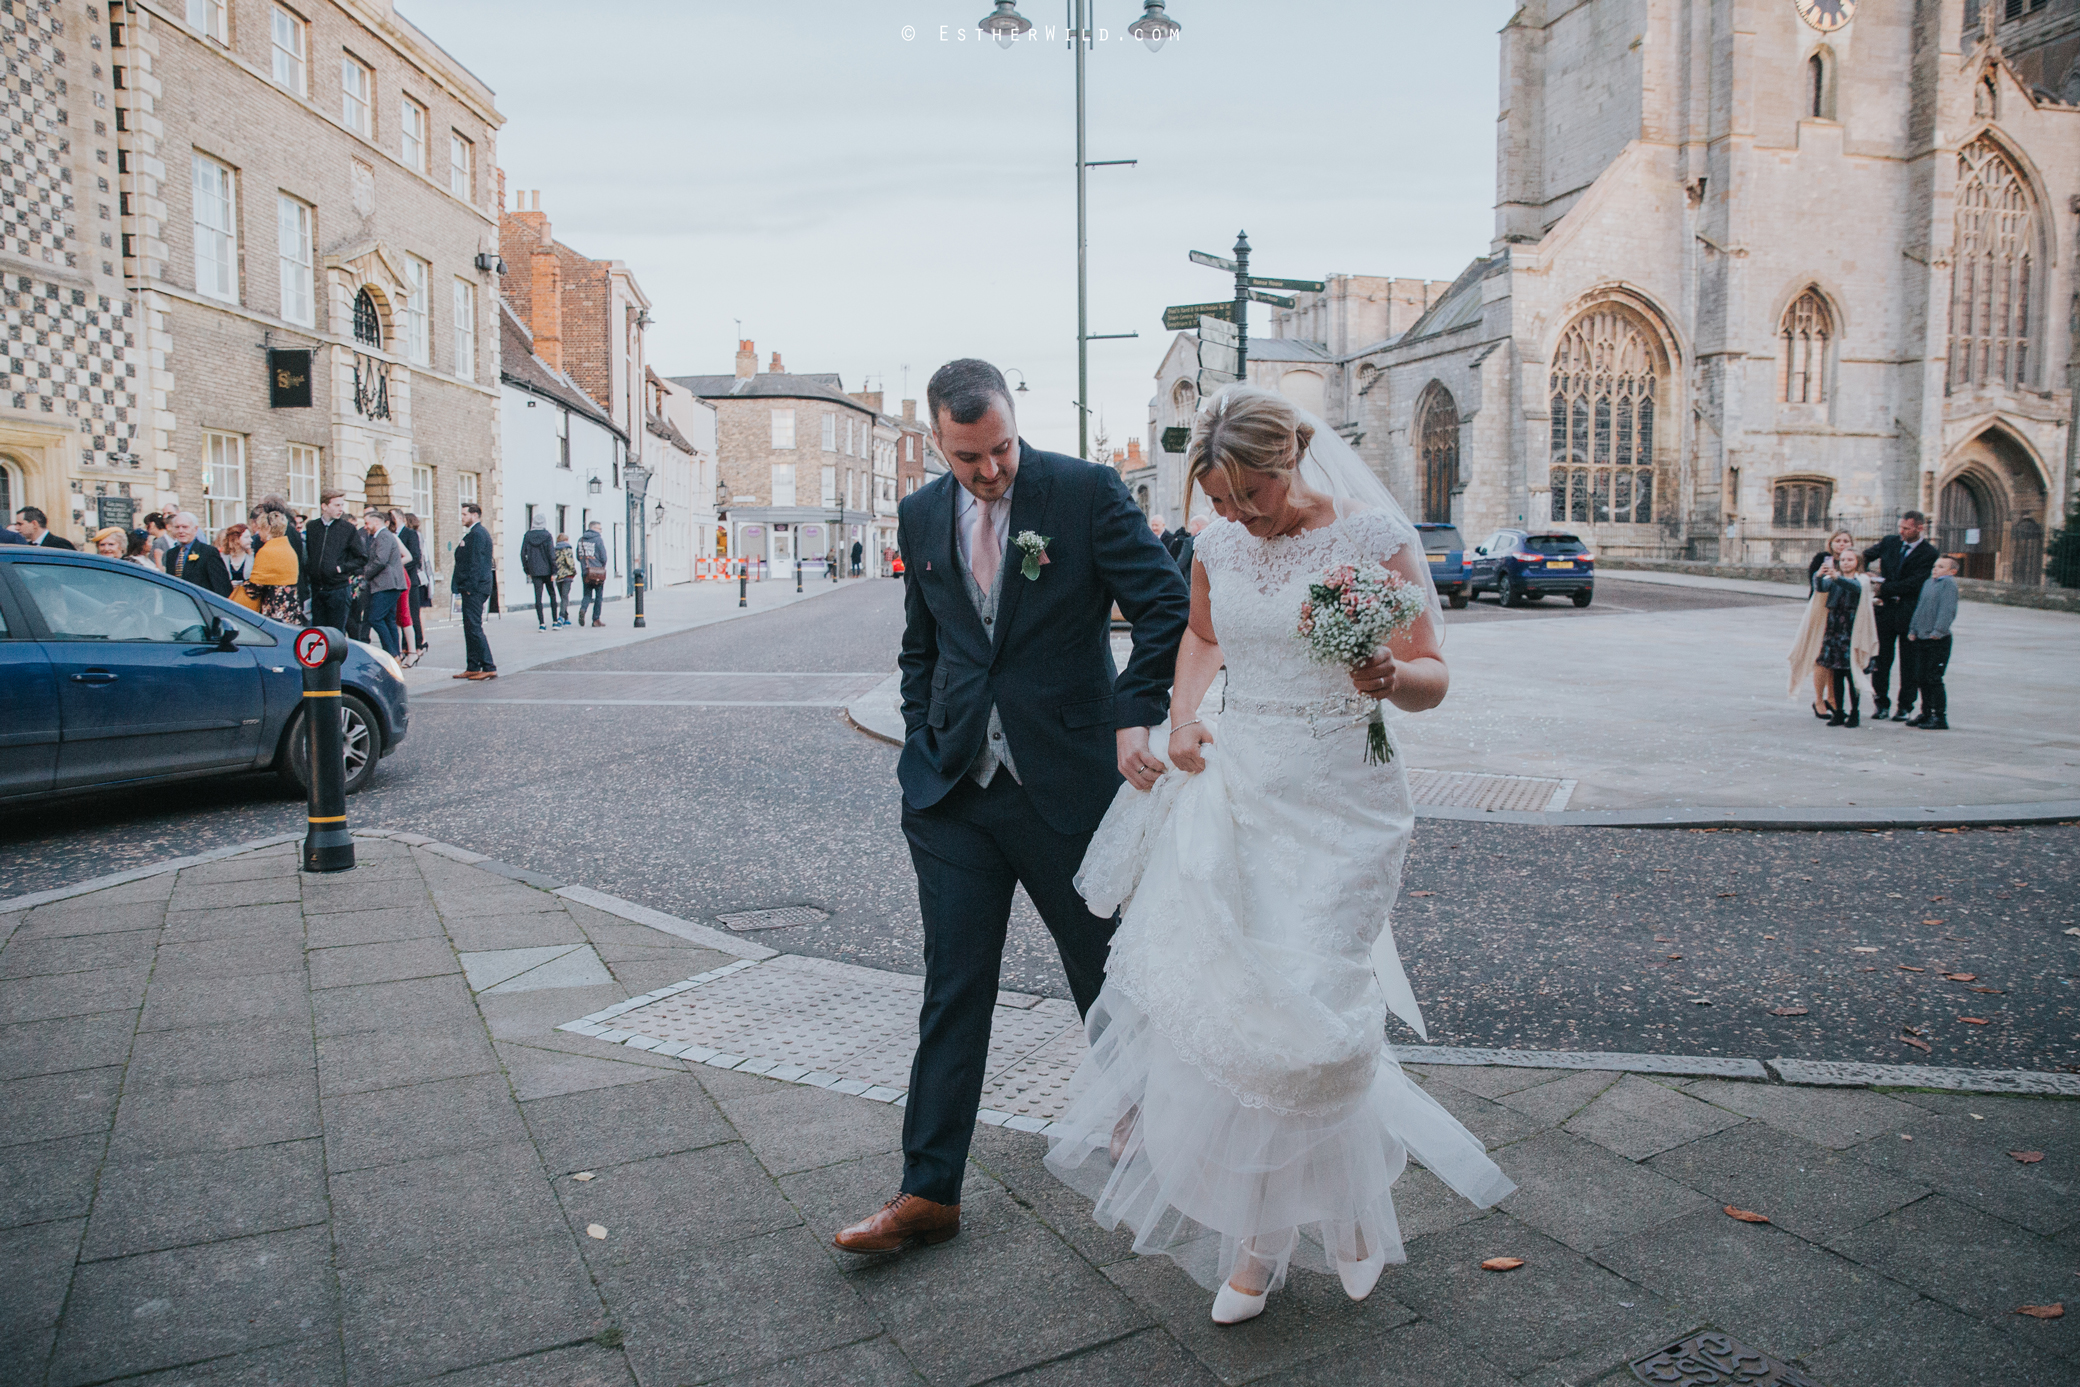 Wedding_Kings_Lynn_Town_Hall_Norfolk_Photographer_Esther_Wild_IMG_1271.jpg